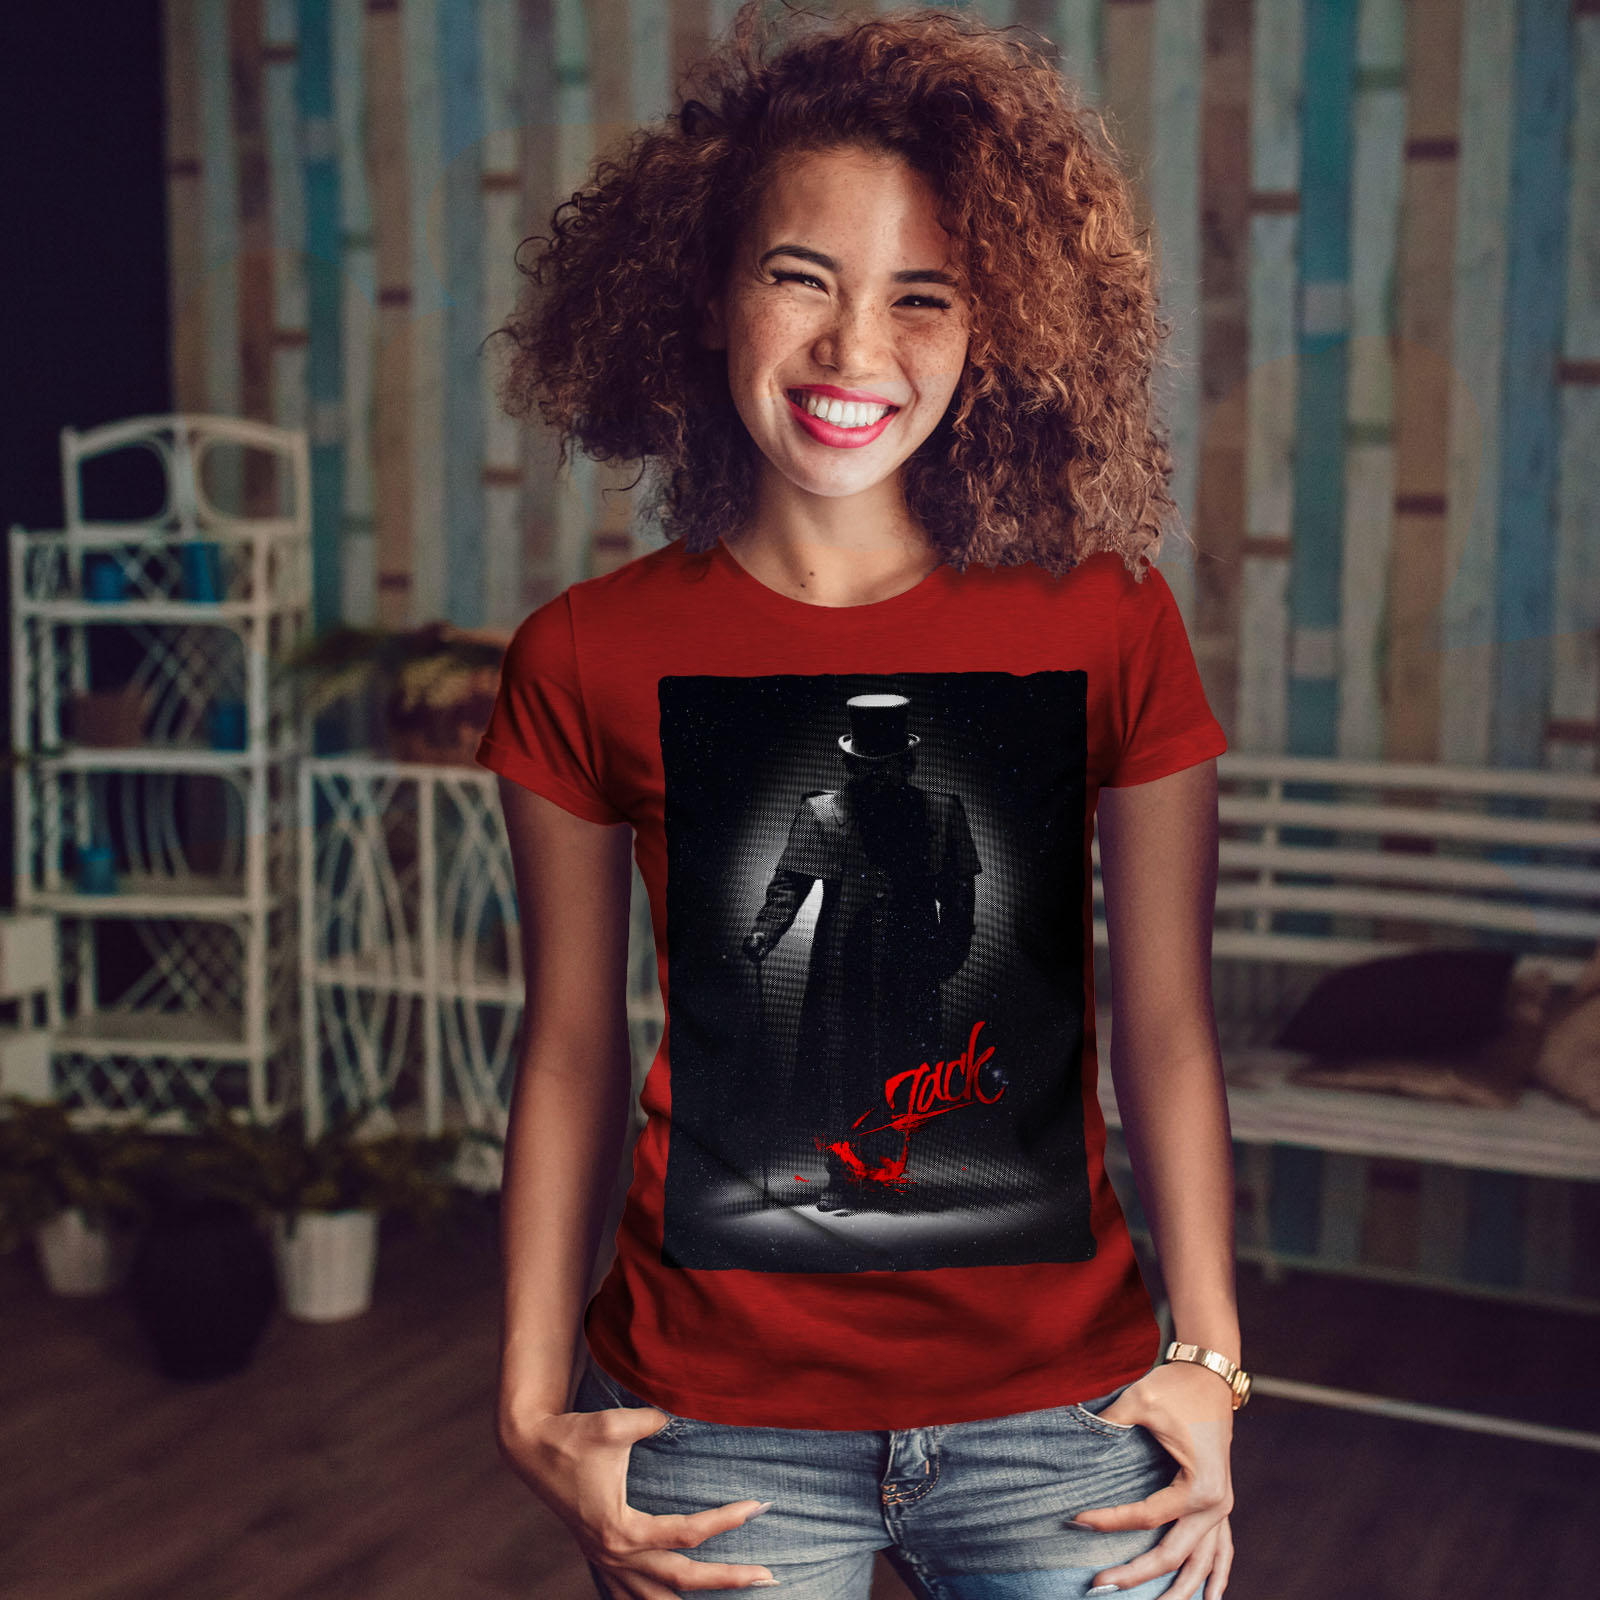 Killer Casual Design Wellcoda Jack The Ripper Fear Womens Long Sleeve T-shirt